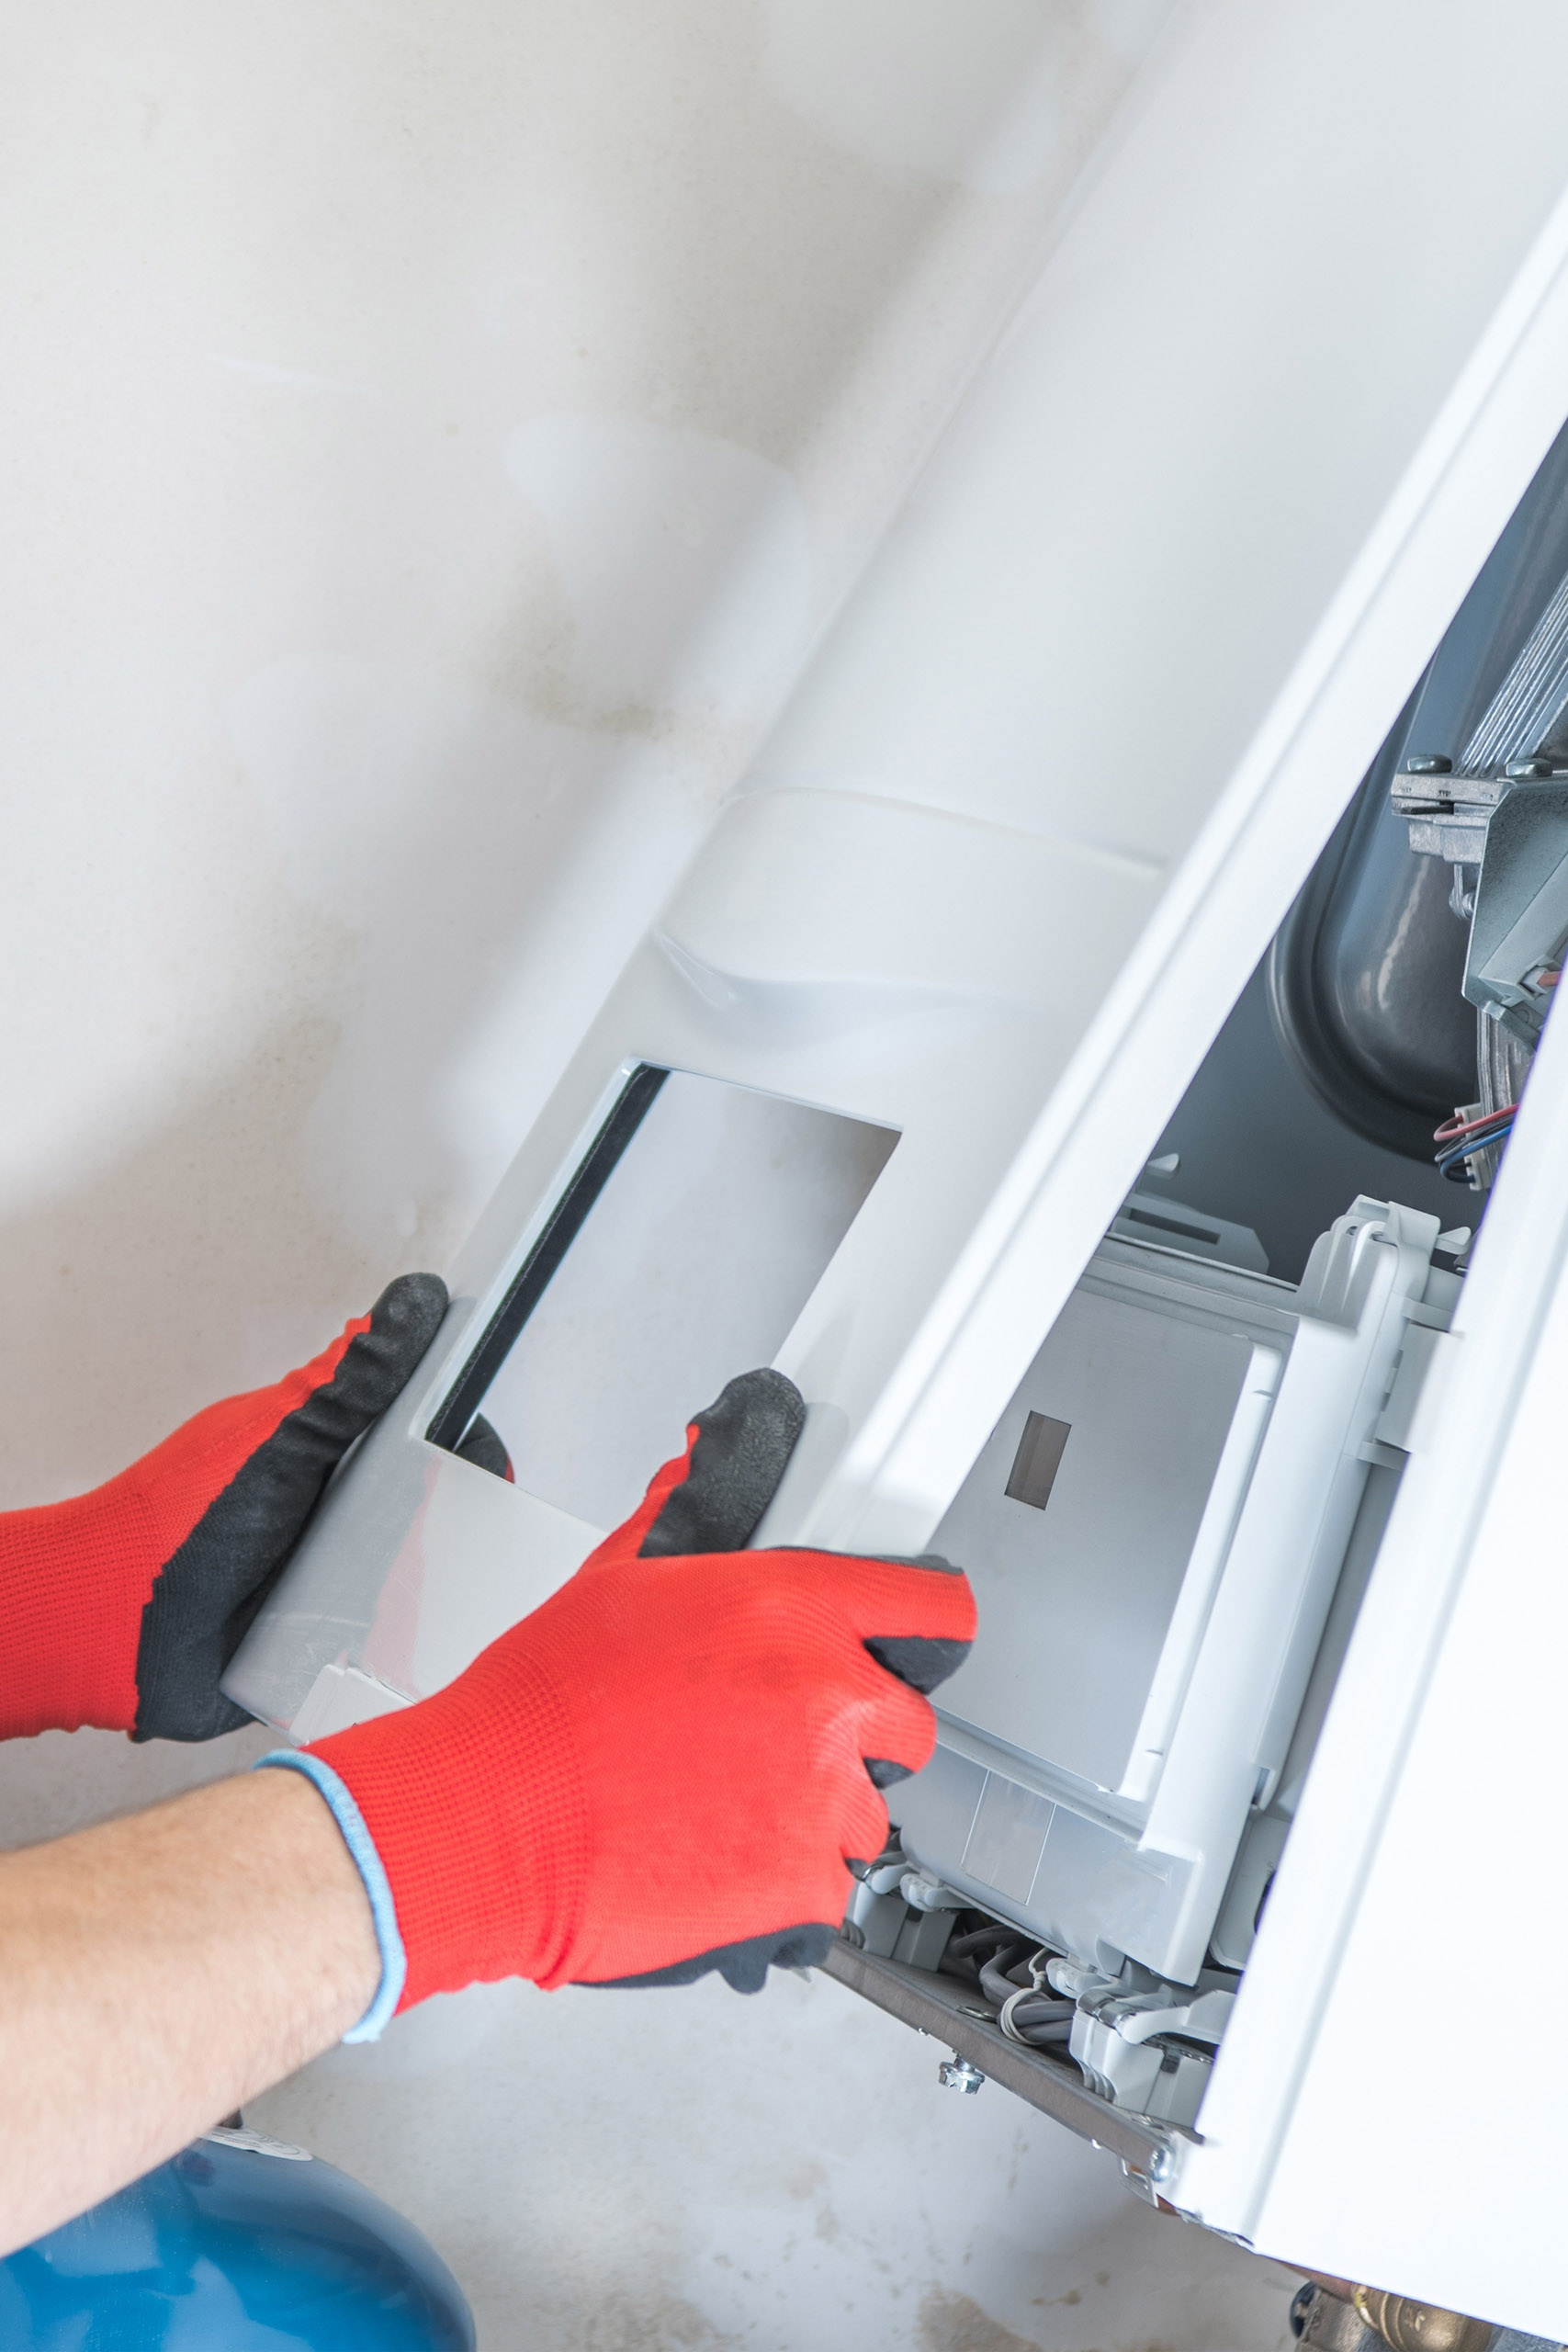 https://lmwilson.com/wp-content/uploads/2020/07/heating-maintenance_288511091.jpg